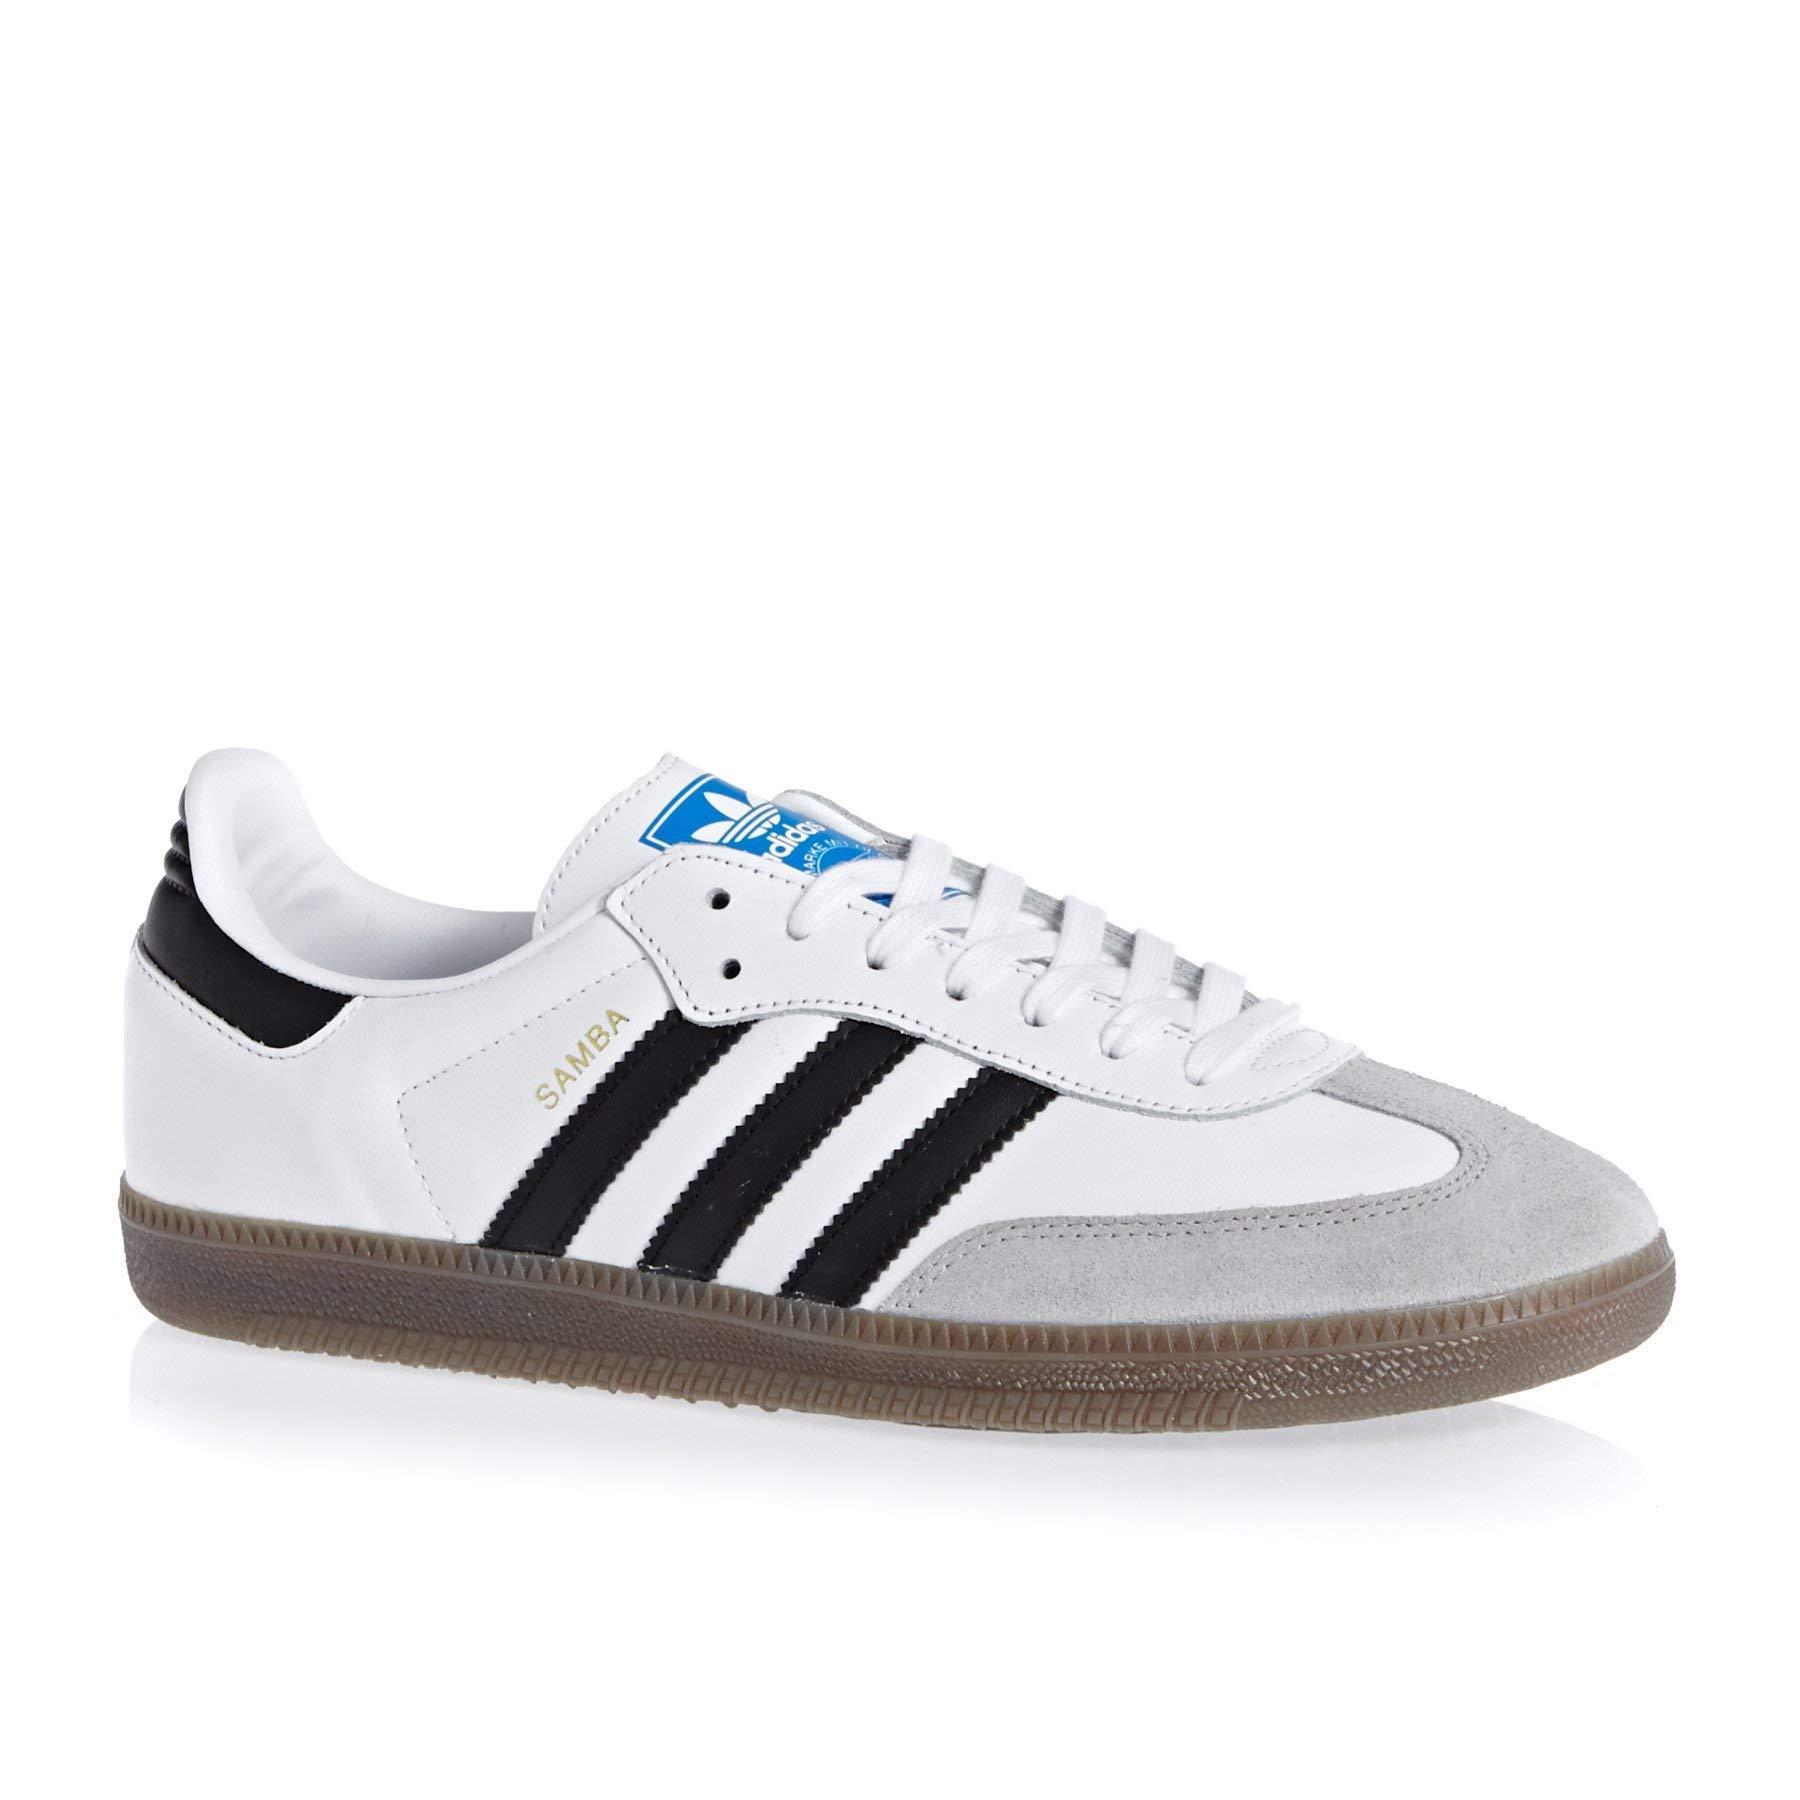 adidas Mens Samba Leather Suede White Black Granite Trainers 7.5 US